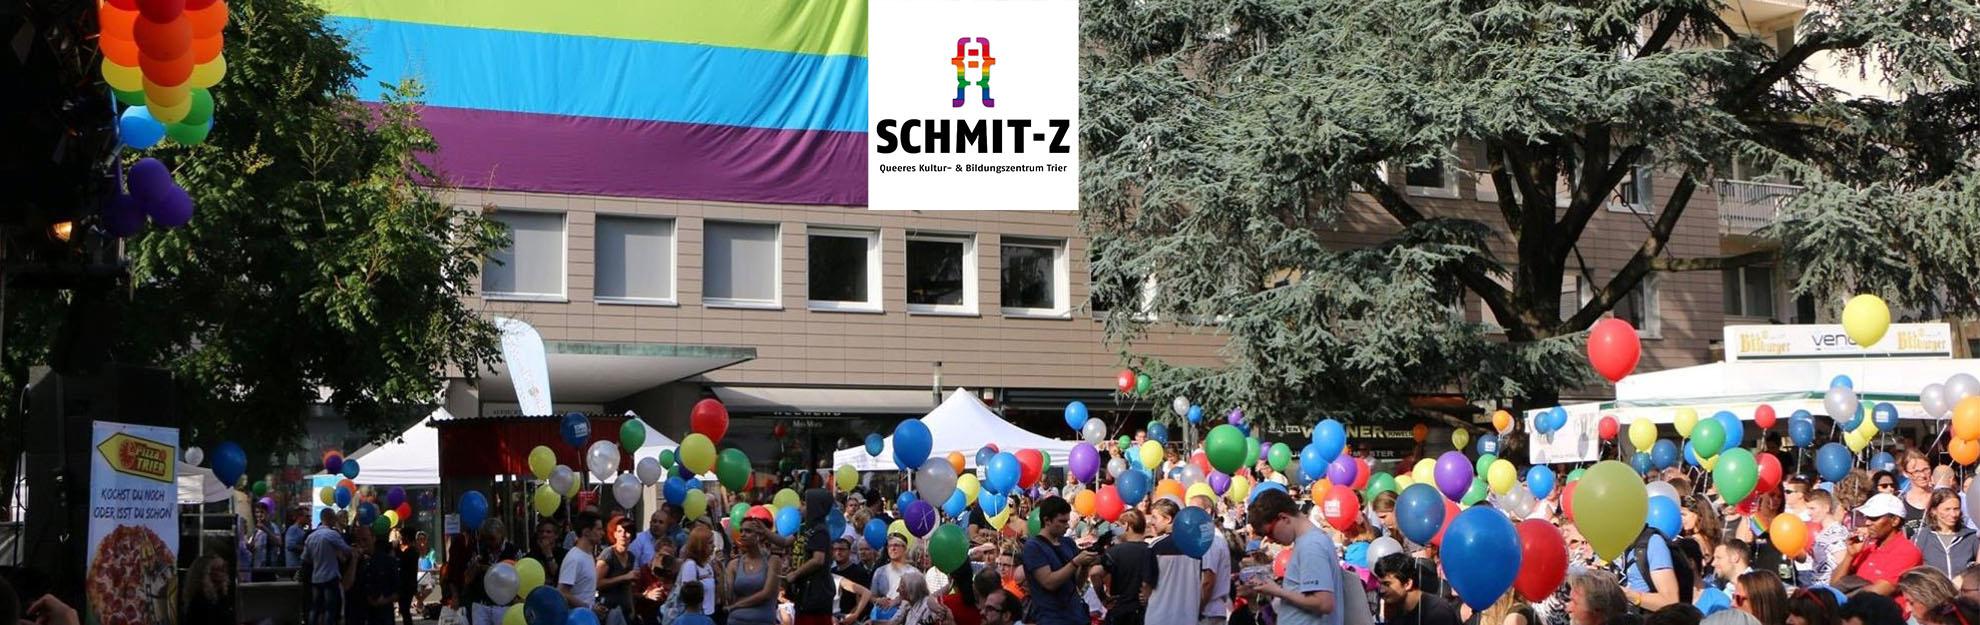 SCHMIT-Z e.V.